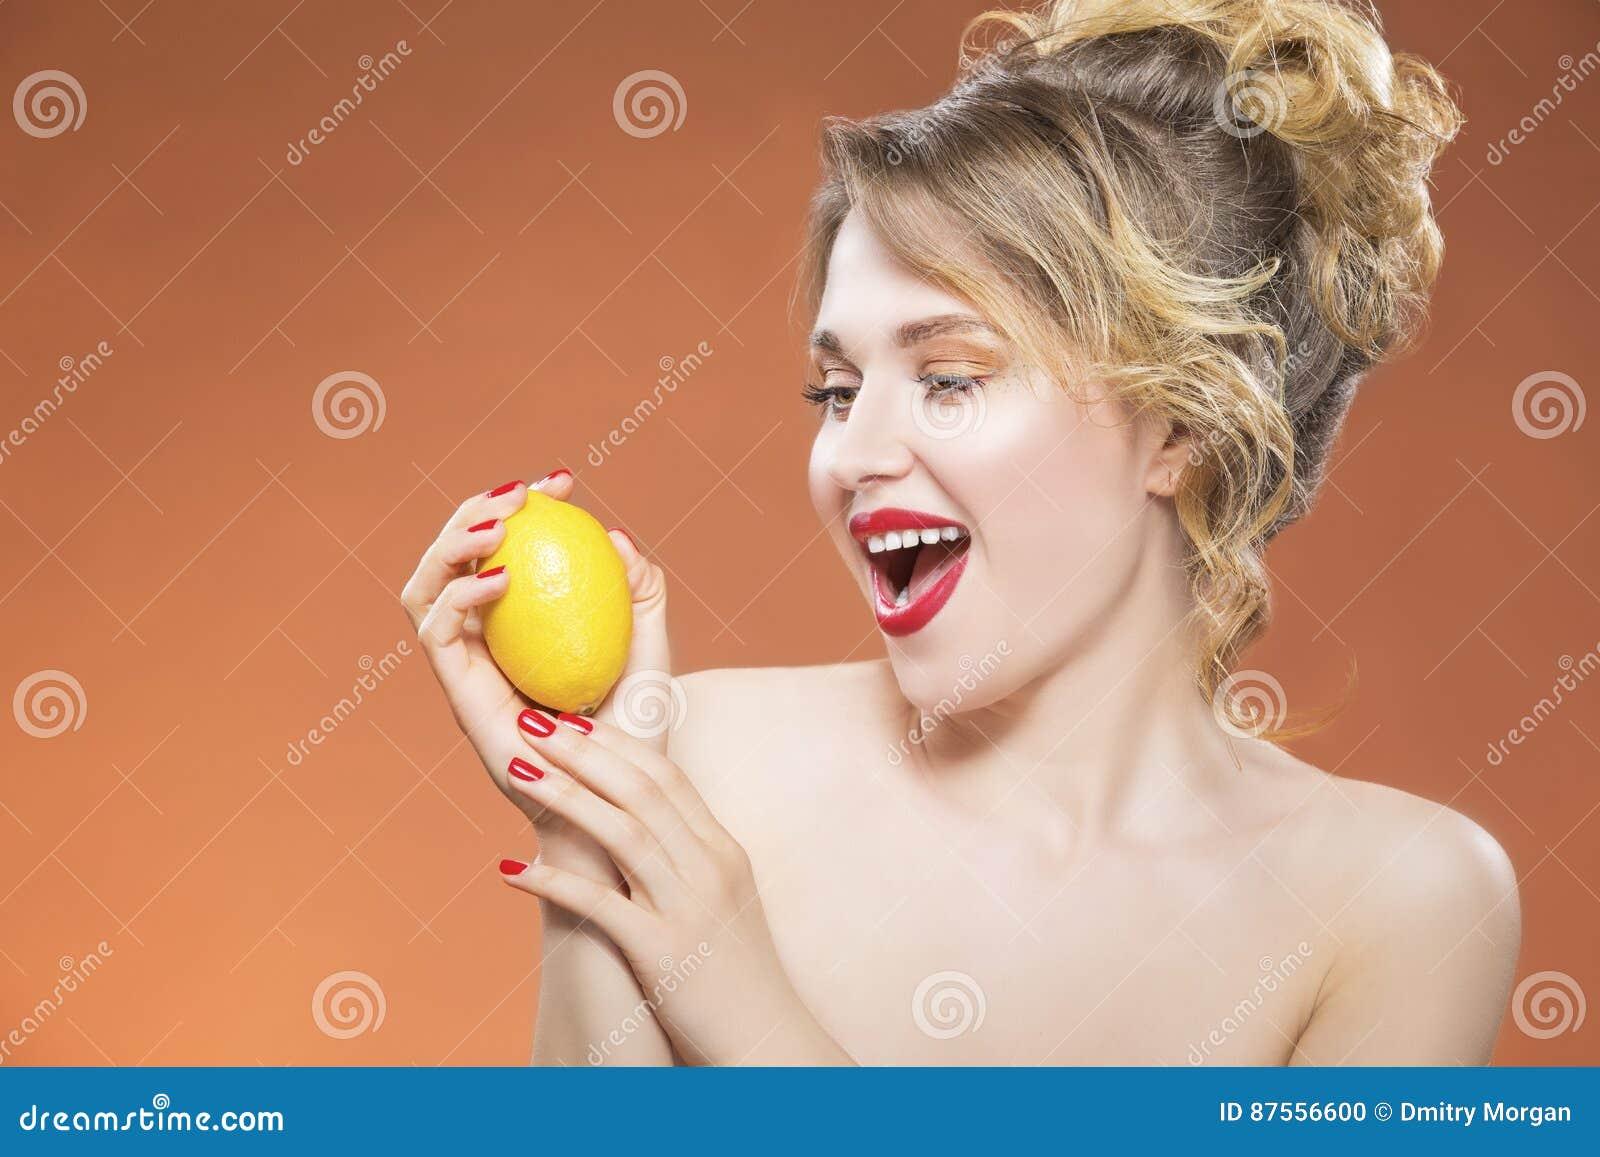 Believe, Fruit look like naked girl